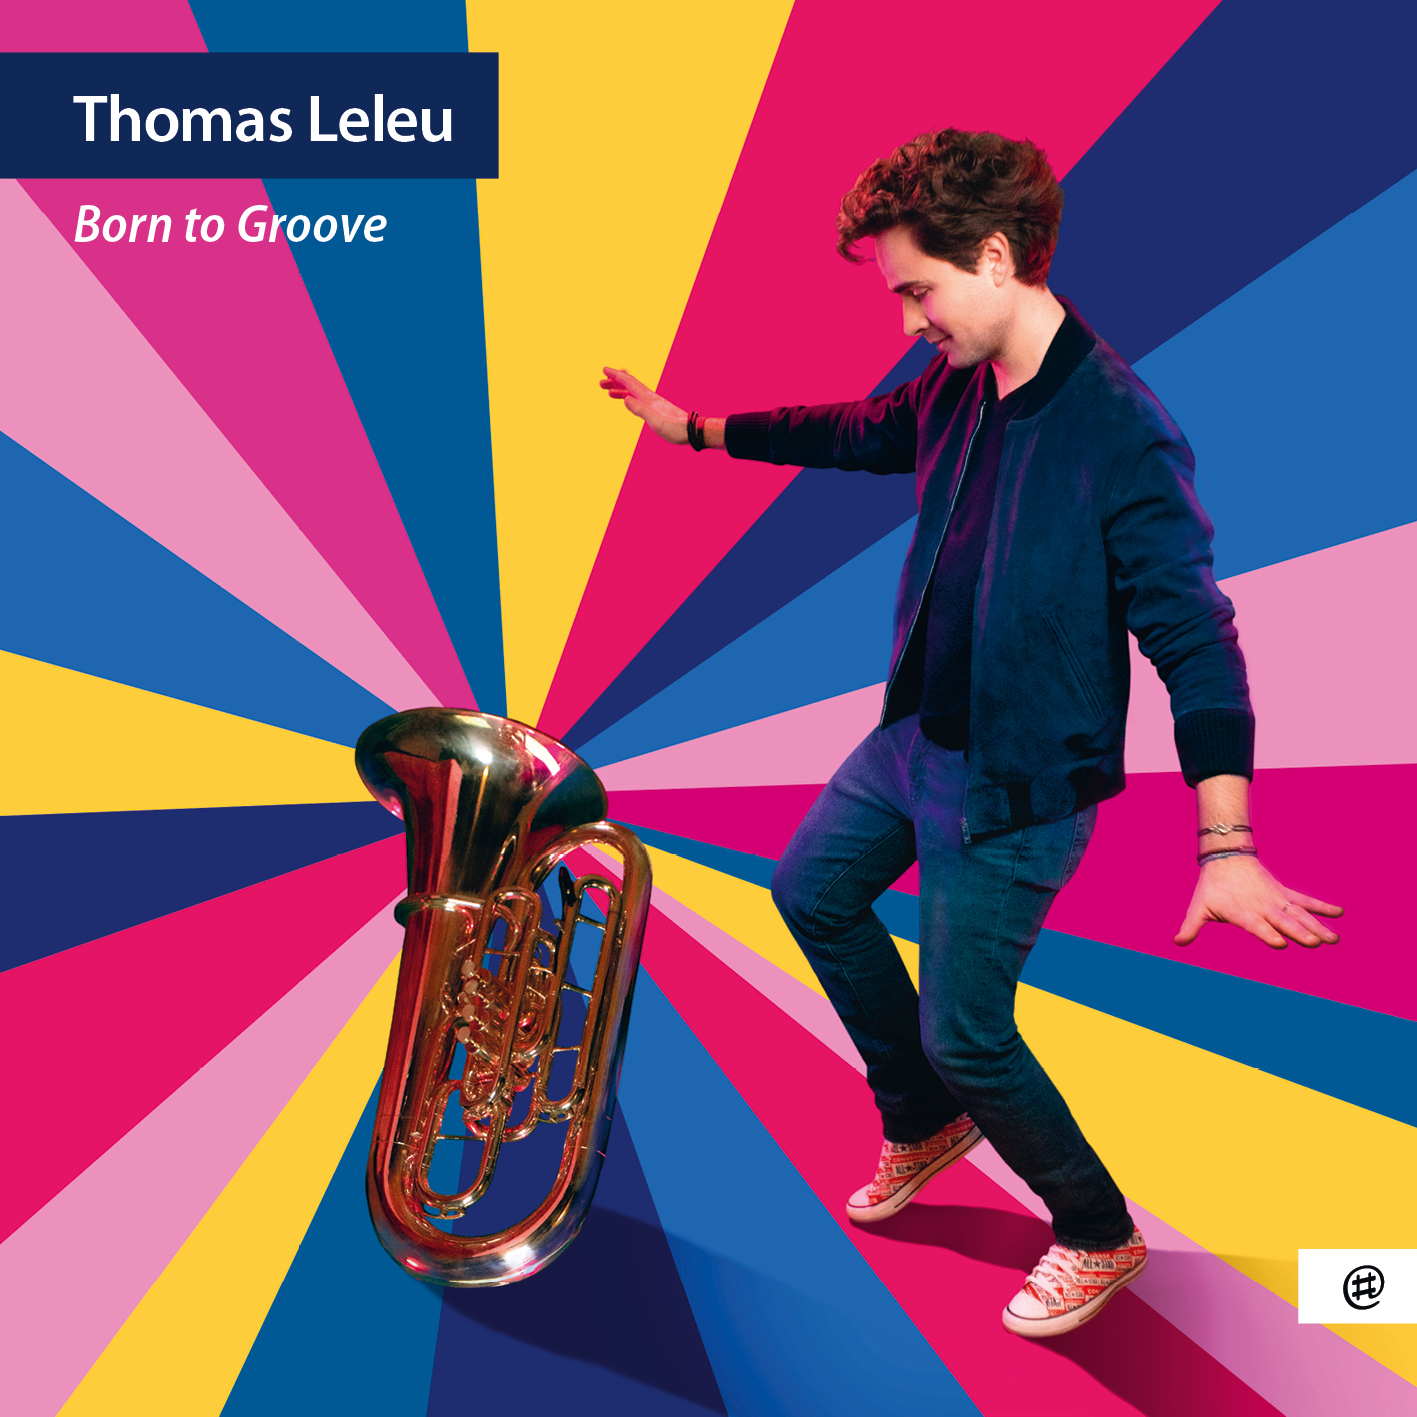 Born to Groove - Thomas Leleu